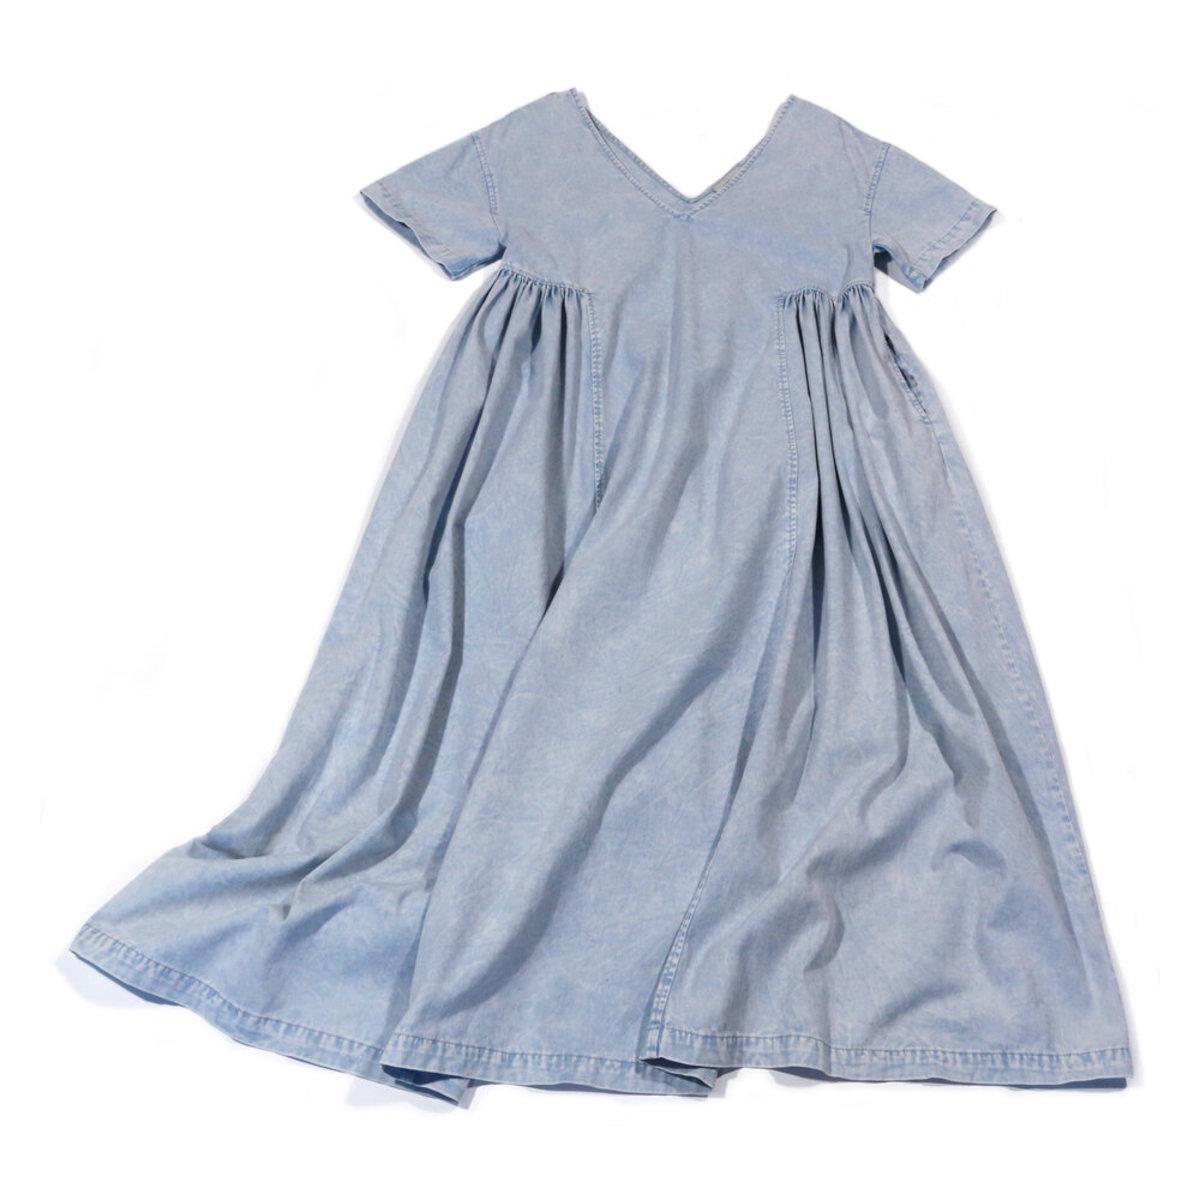 Rachel Comey New Cardiff dress in Sky denim